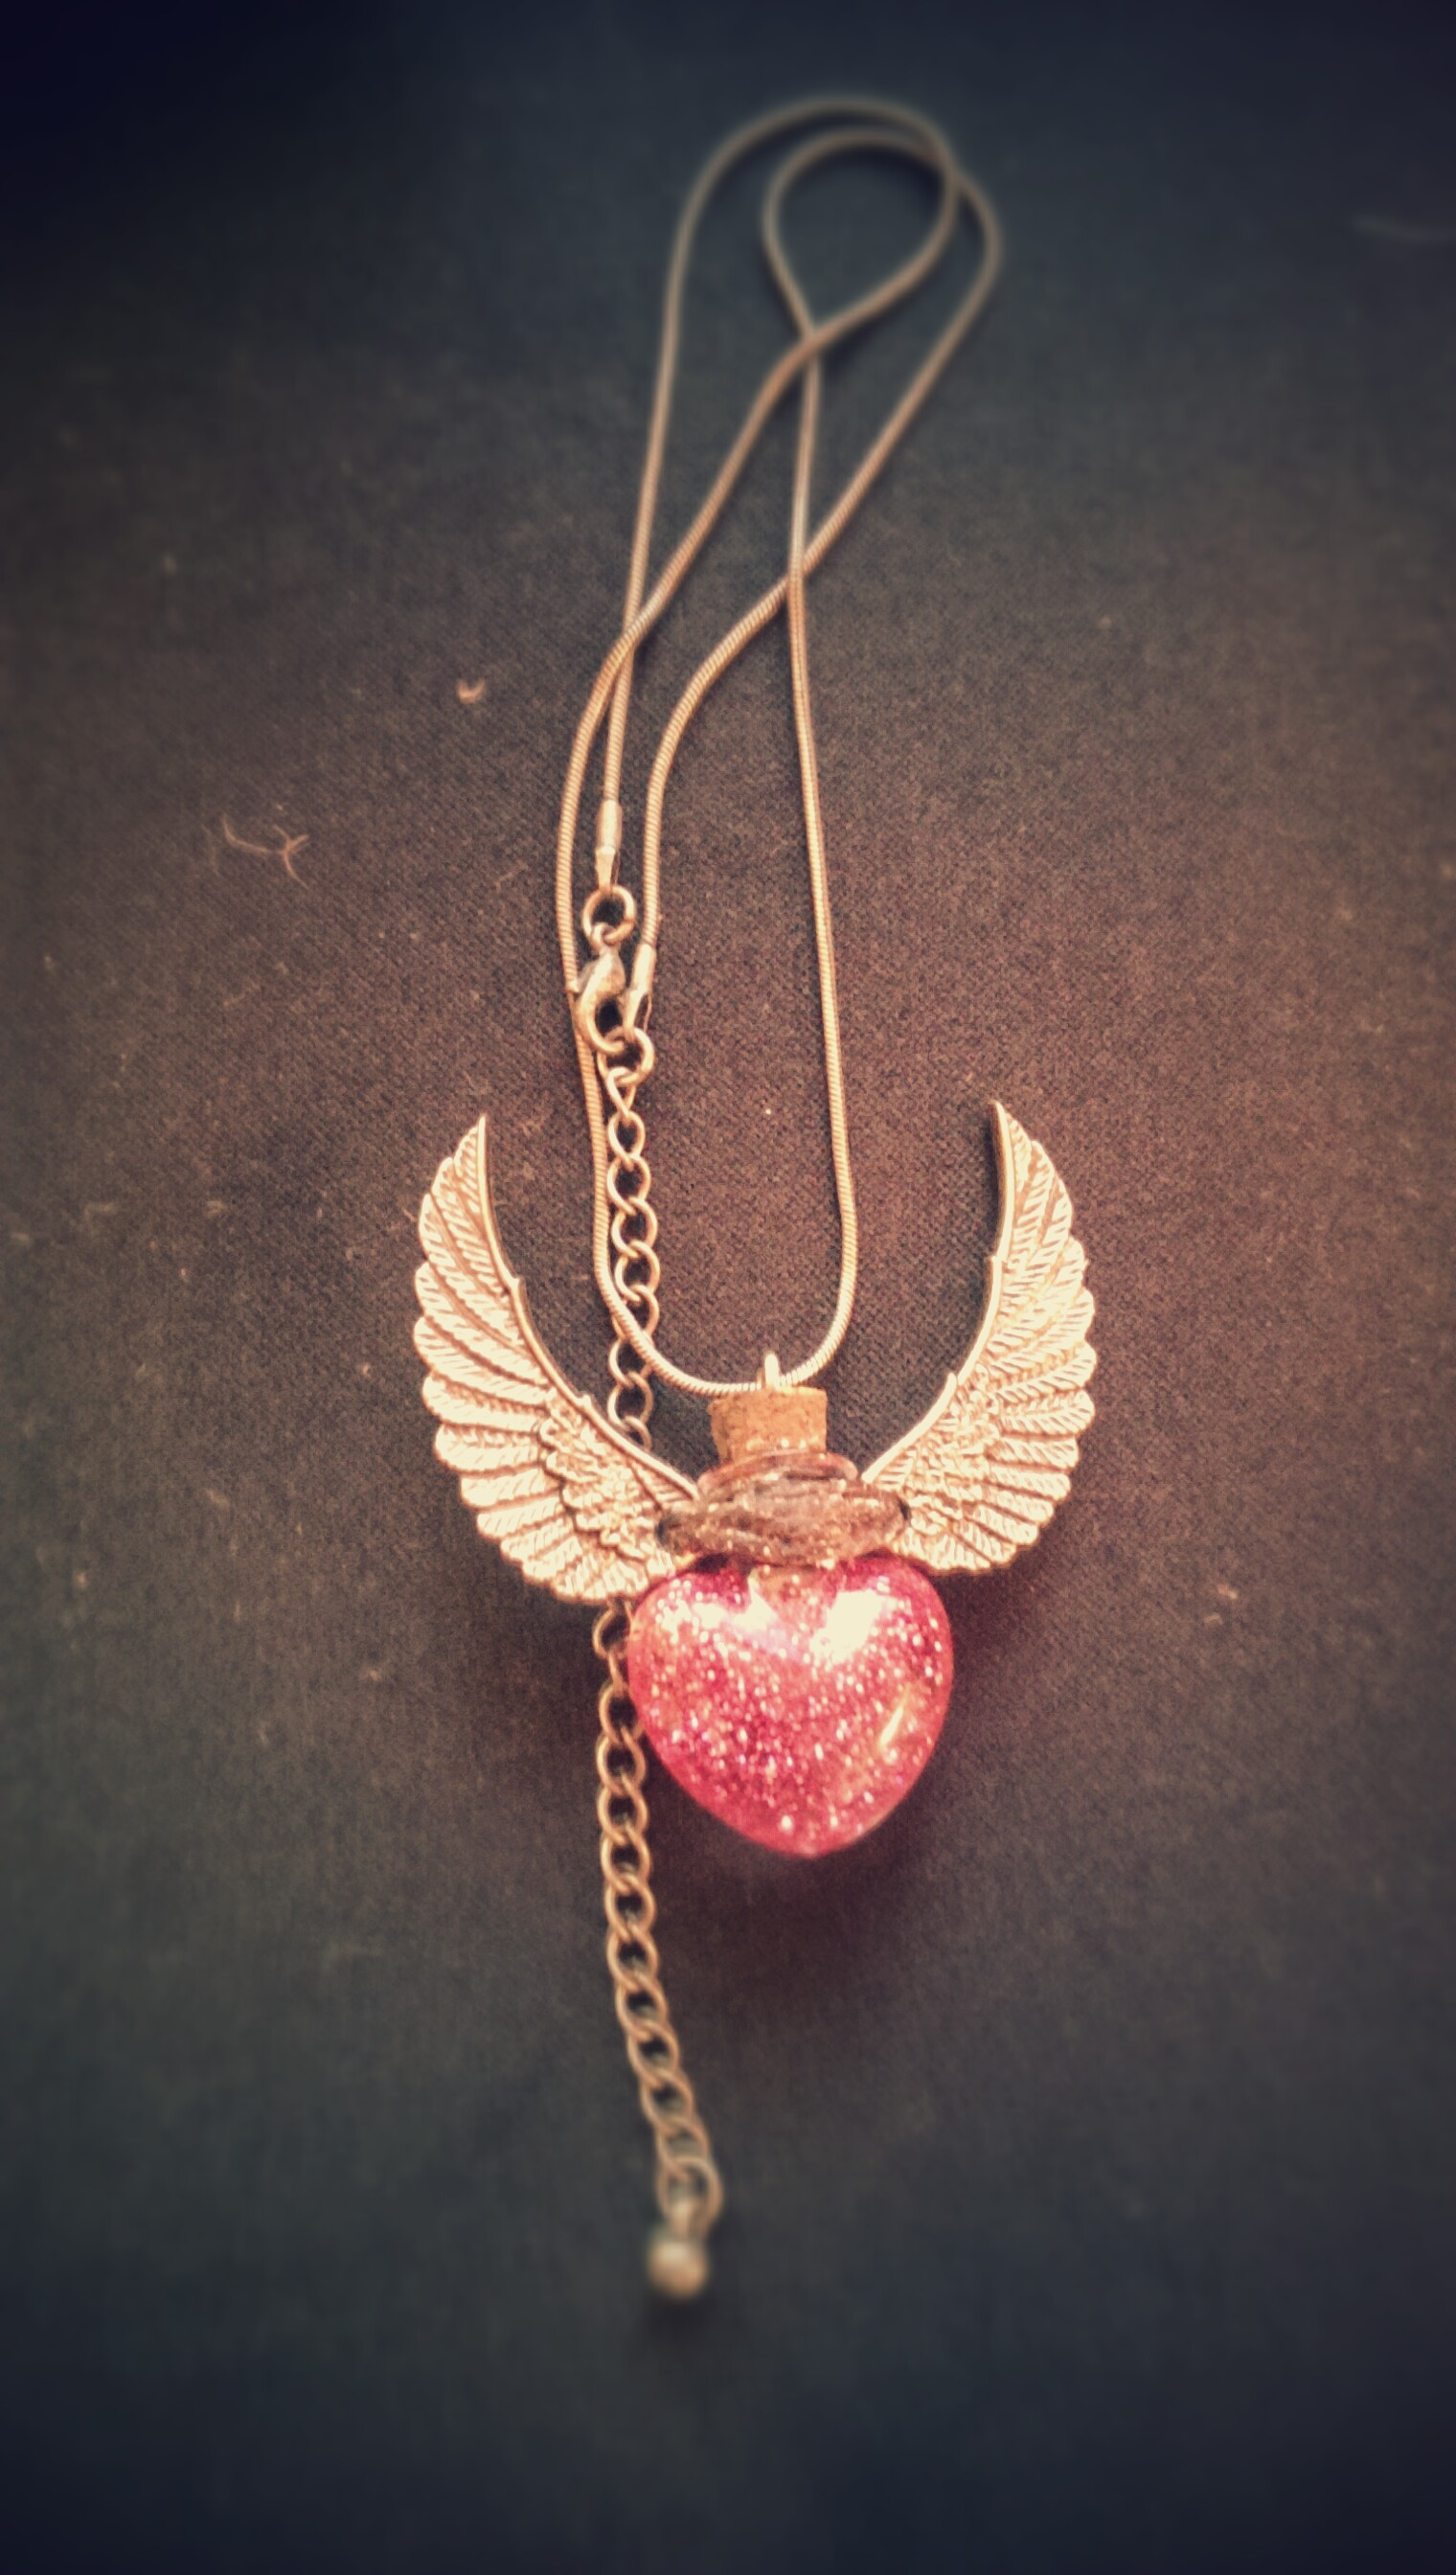 Harry Potter Amortentia Necklace